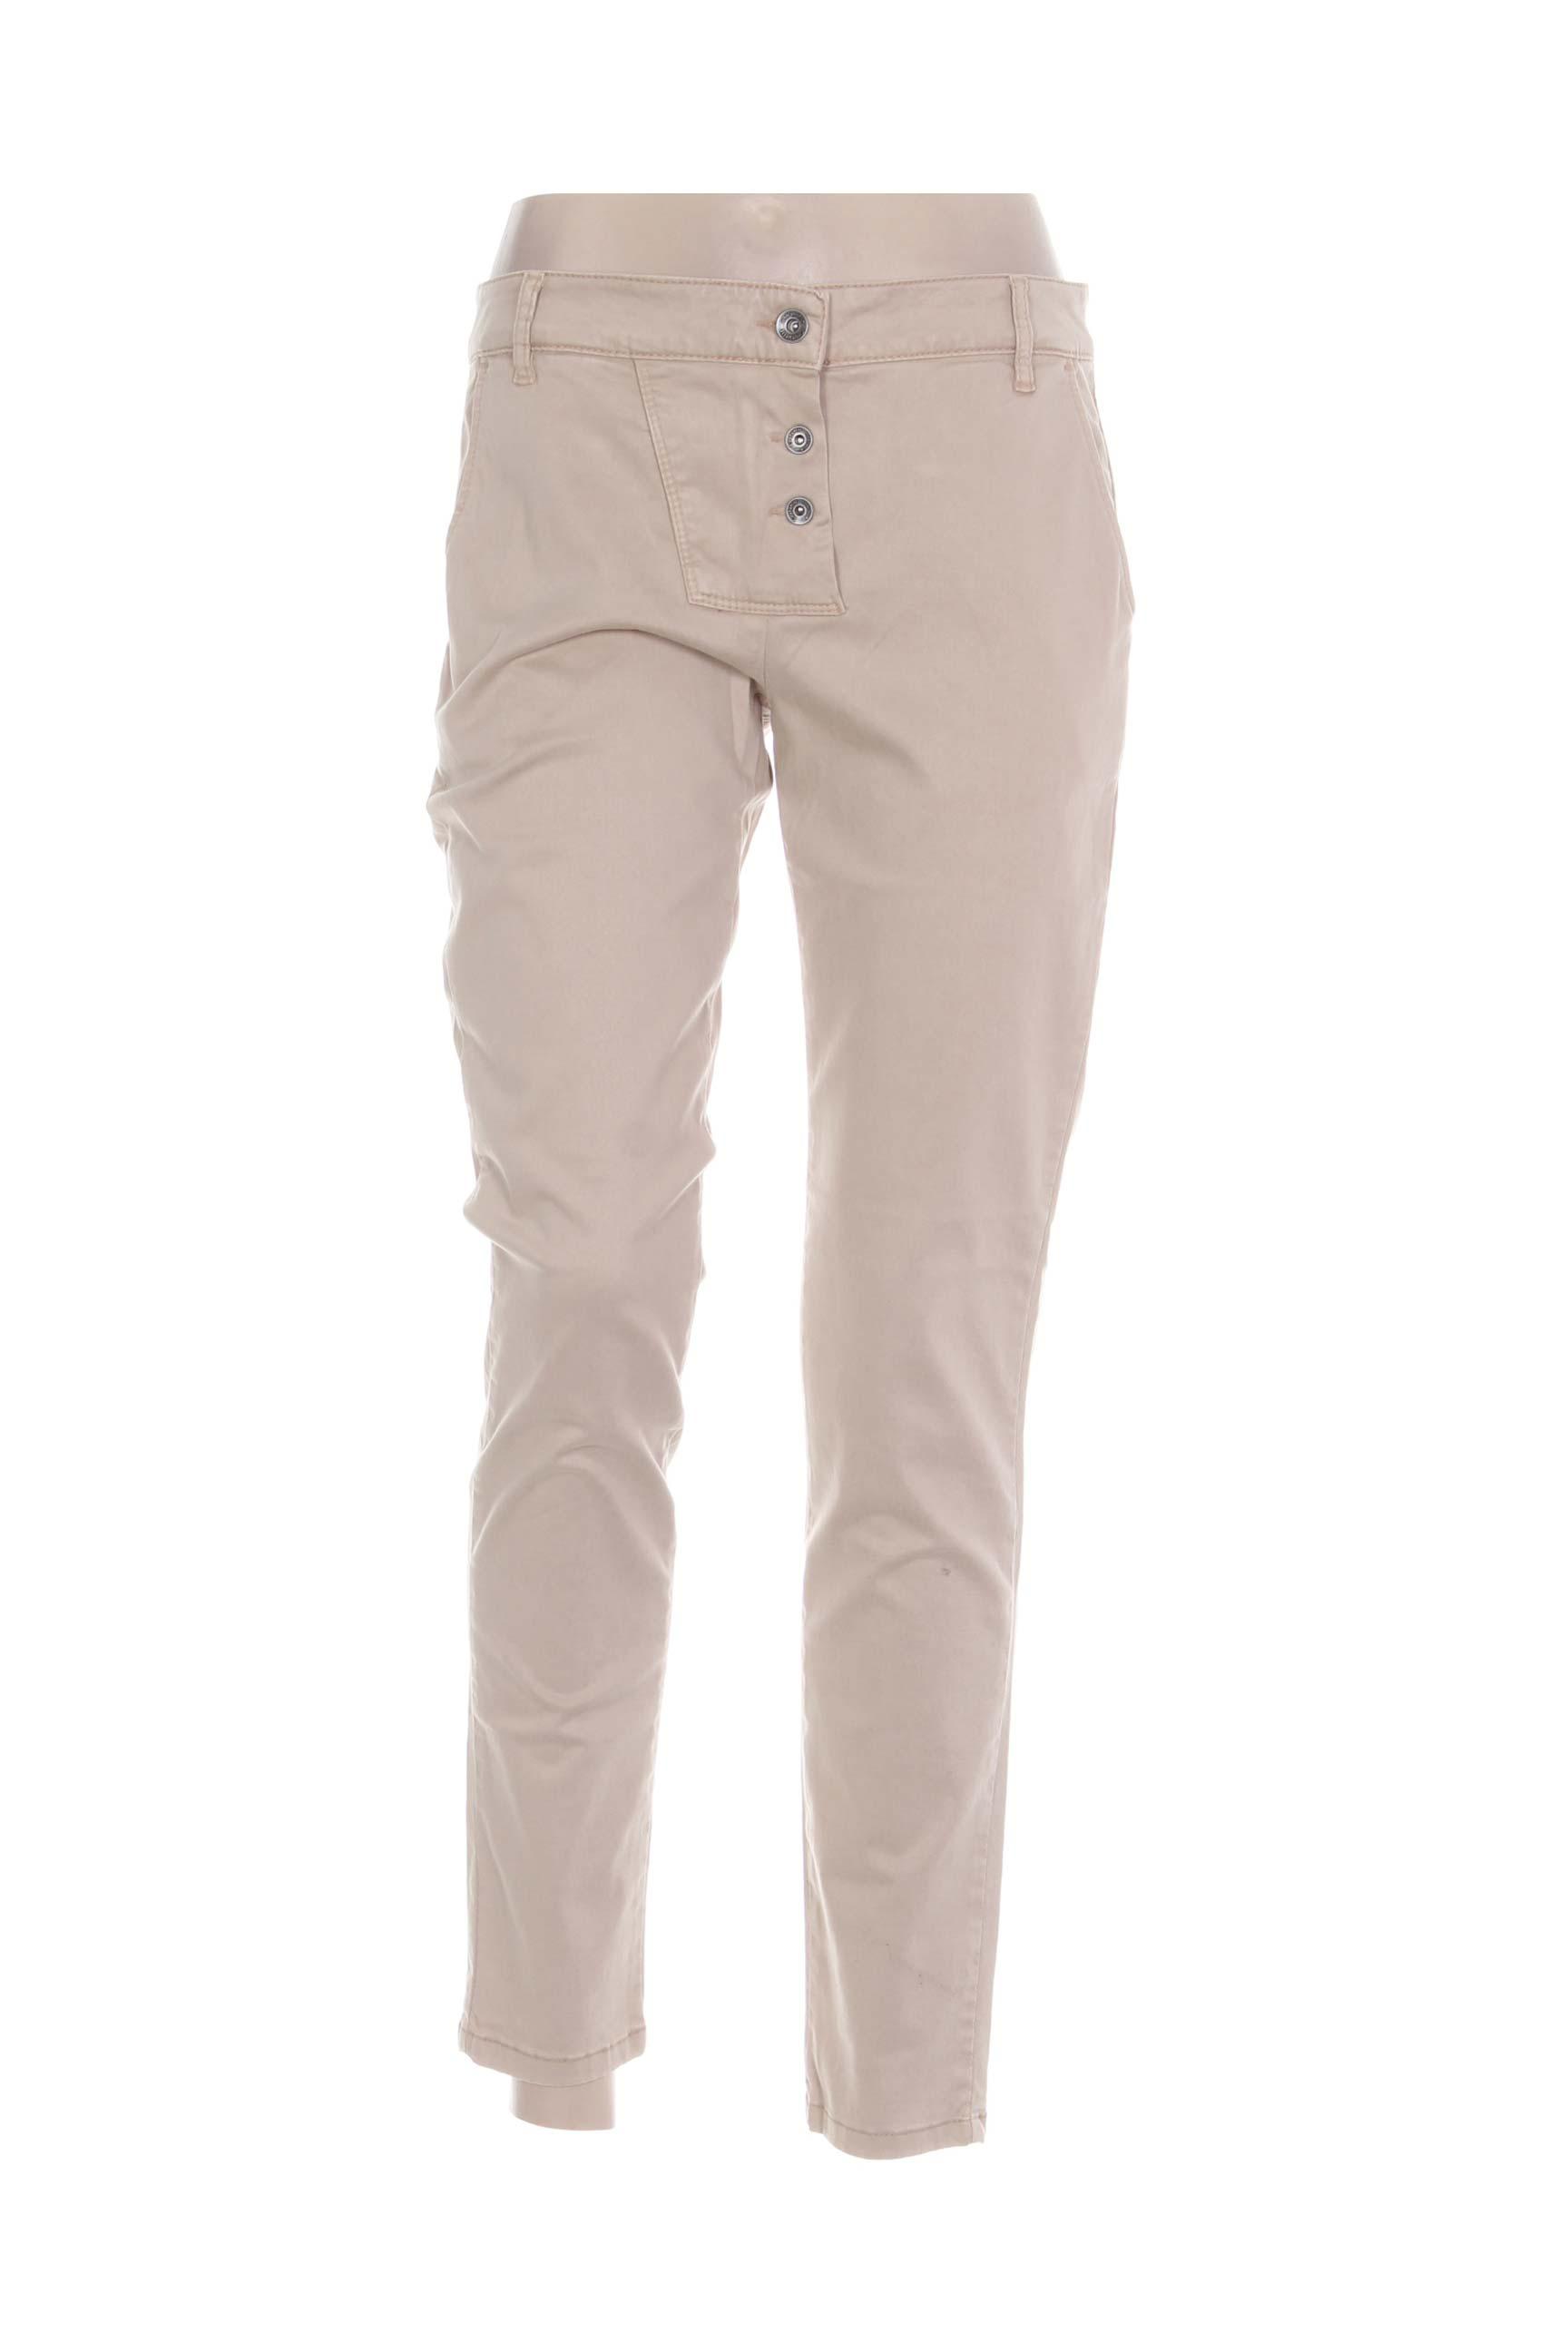 Pantalon casual femme Couturist beige taille : W31 11 FR (FR)